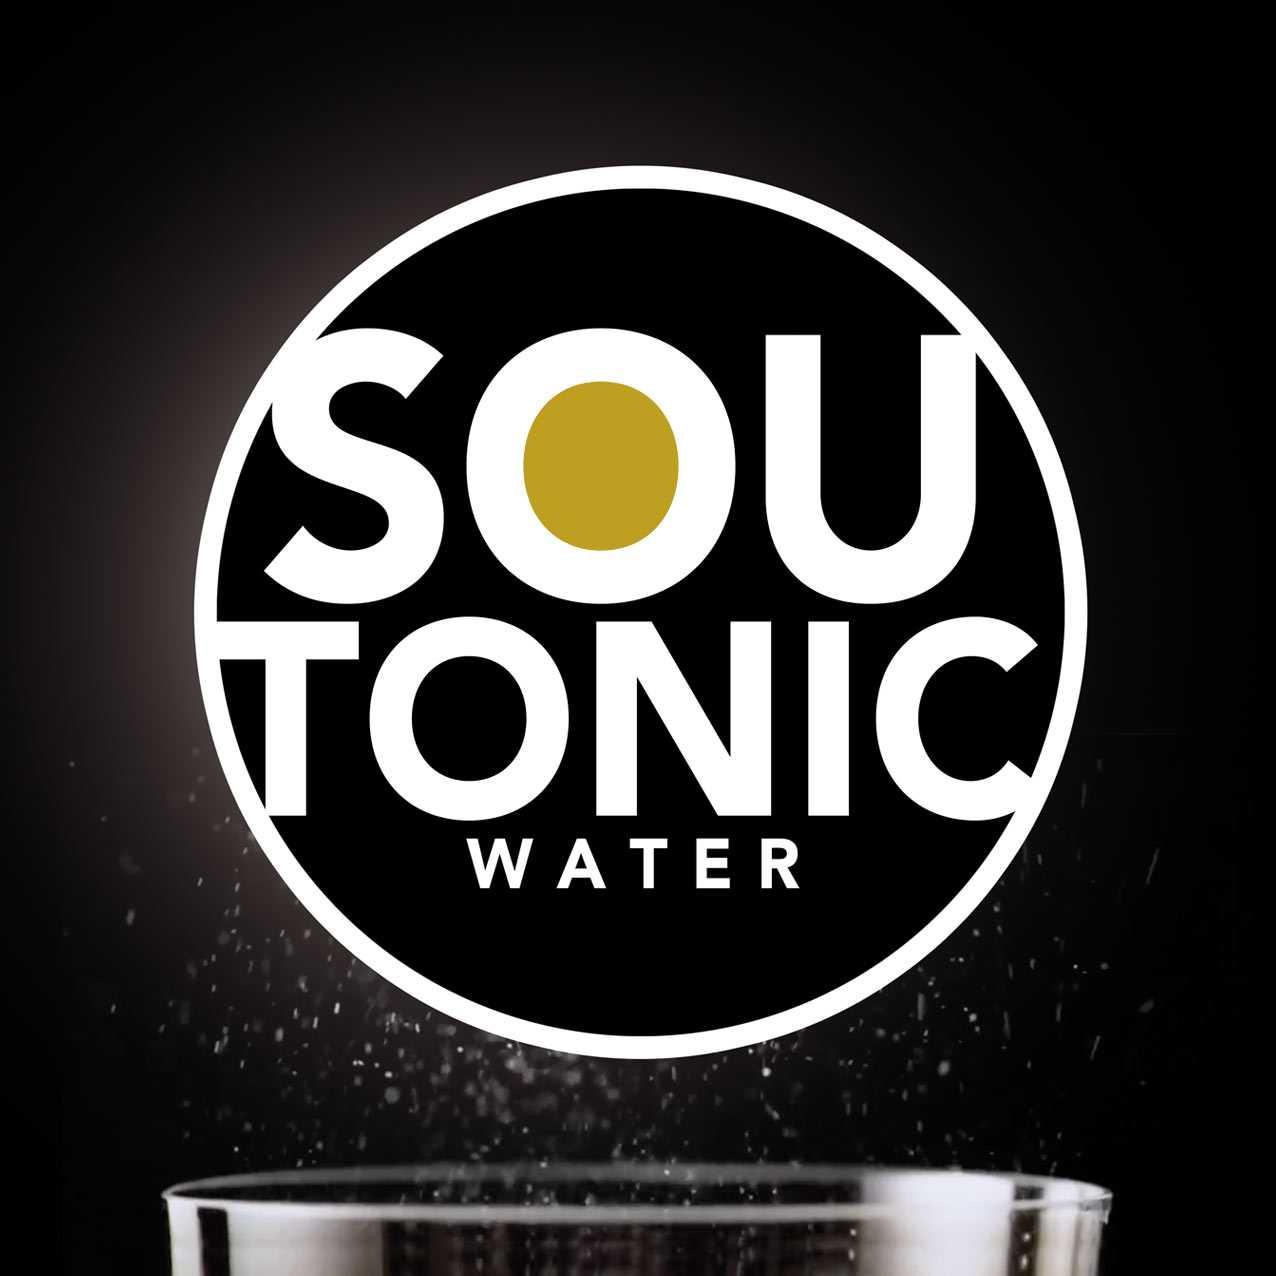 Sou Tonic, Premium Tonic Water